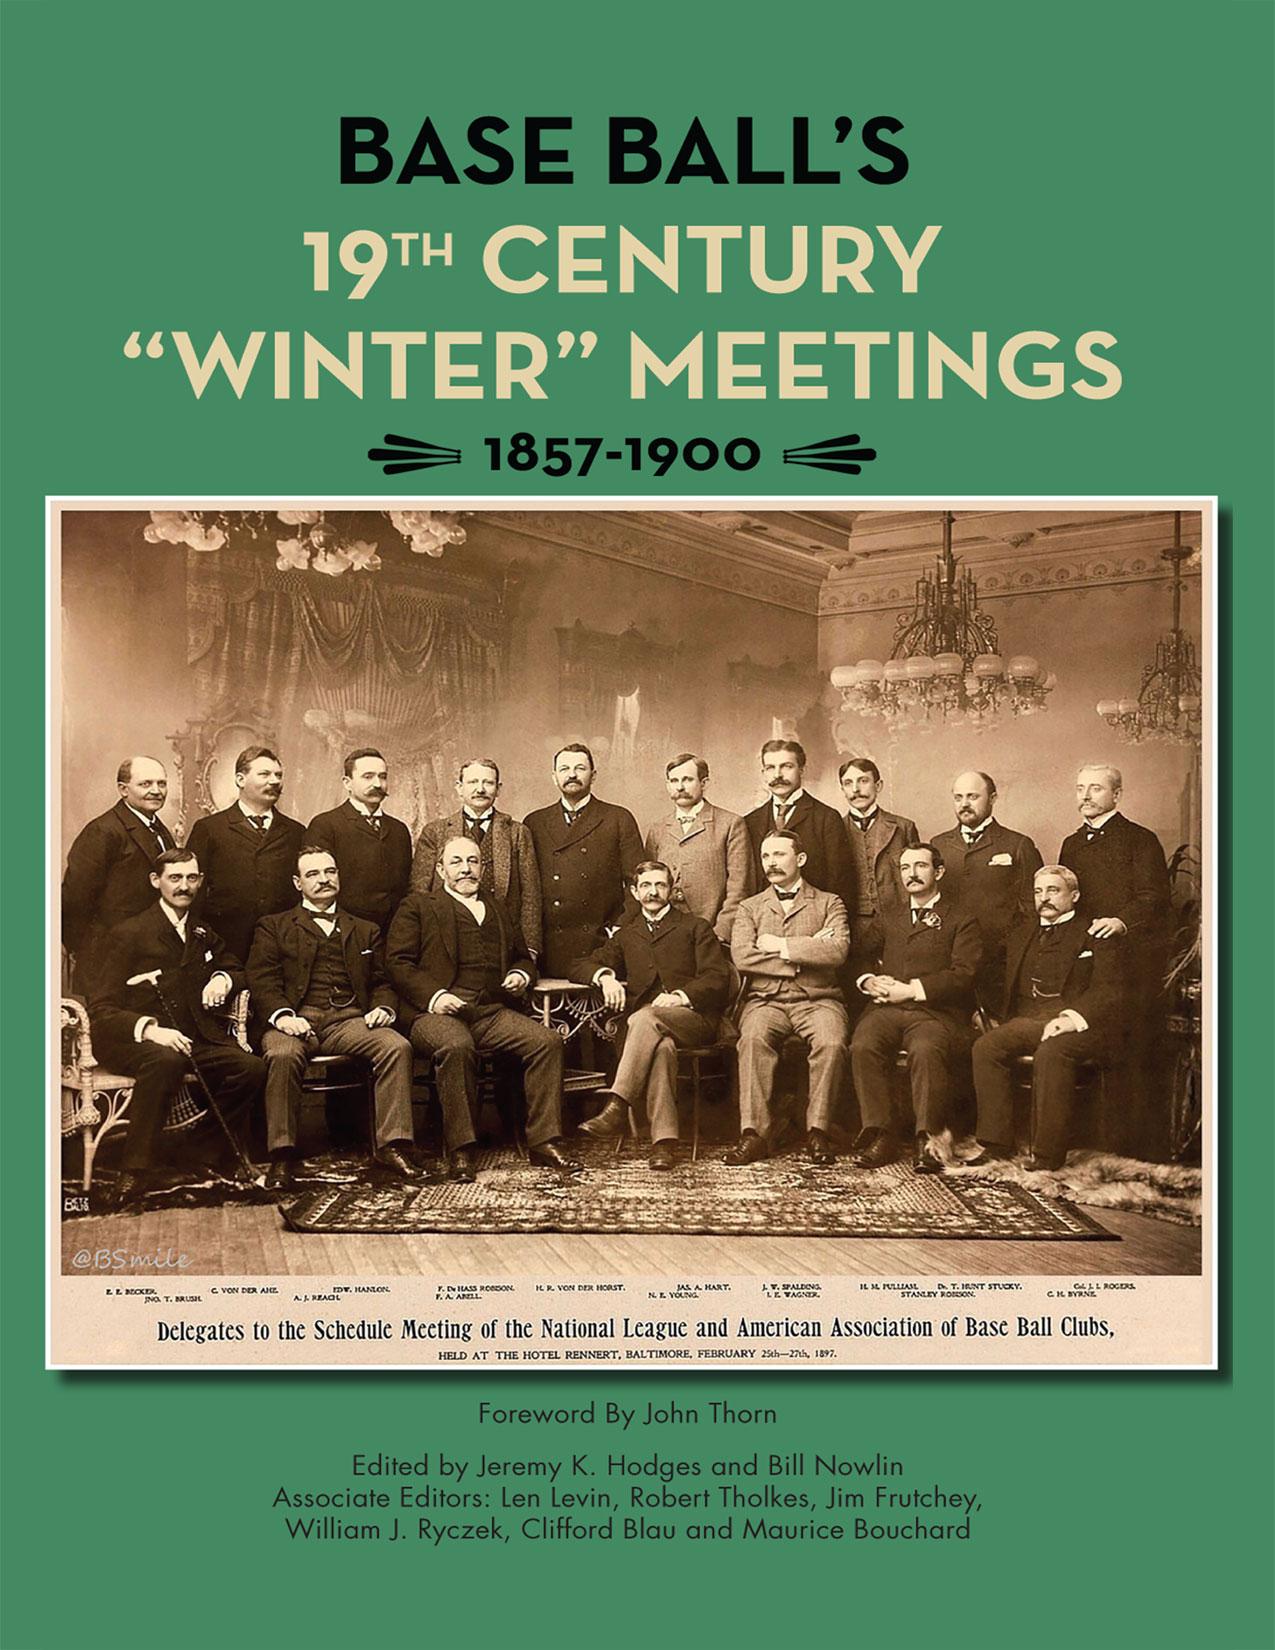 Baseball's 19th Century Winter Meetings: 1857-1900